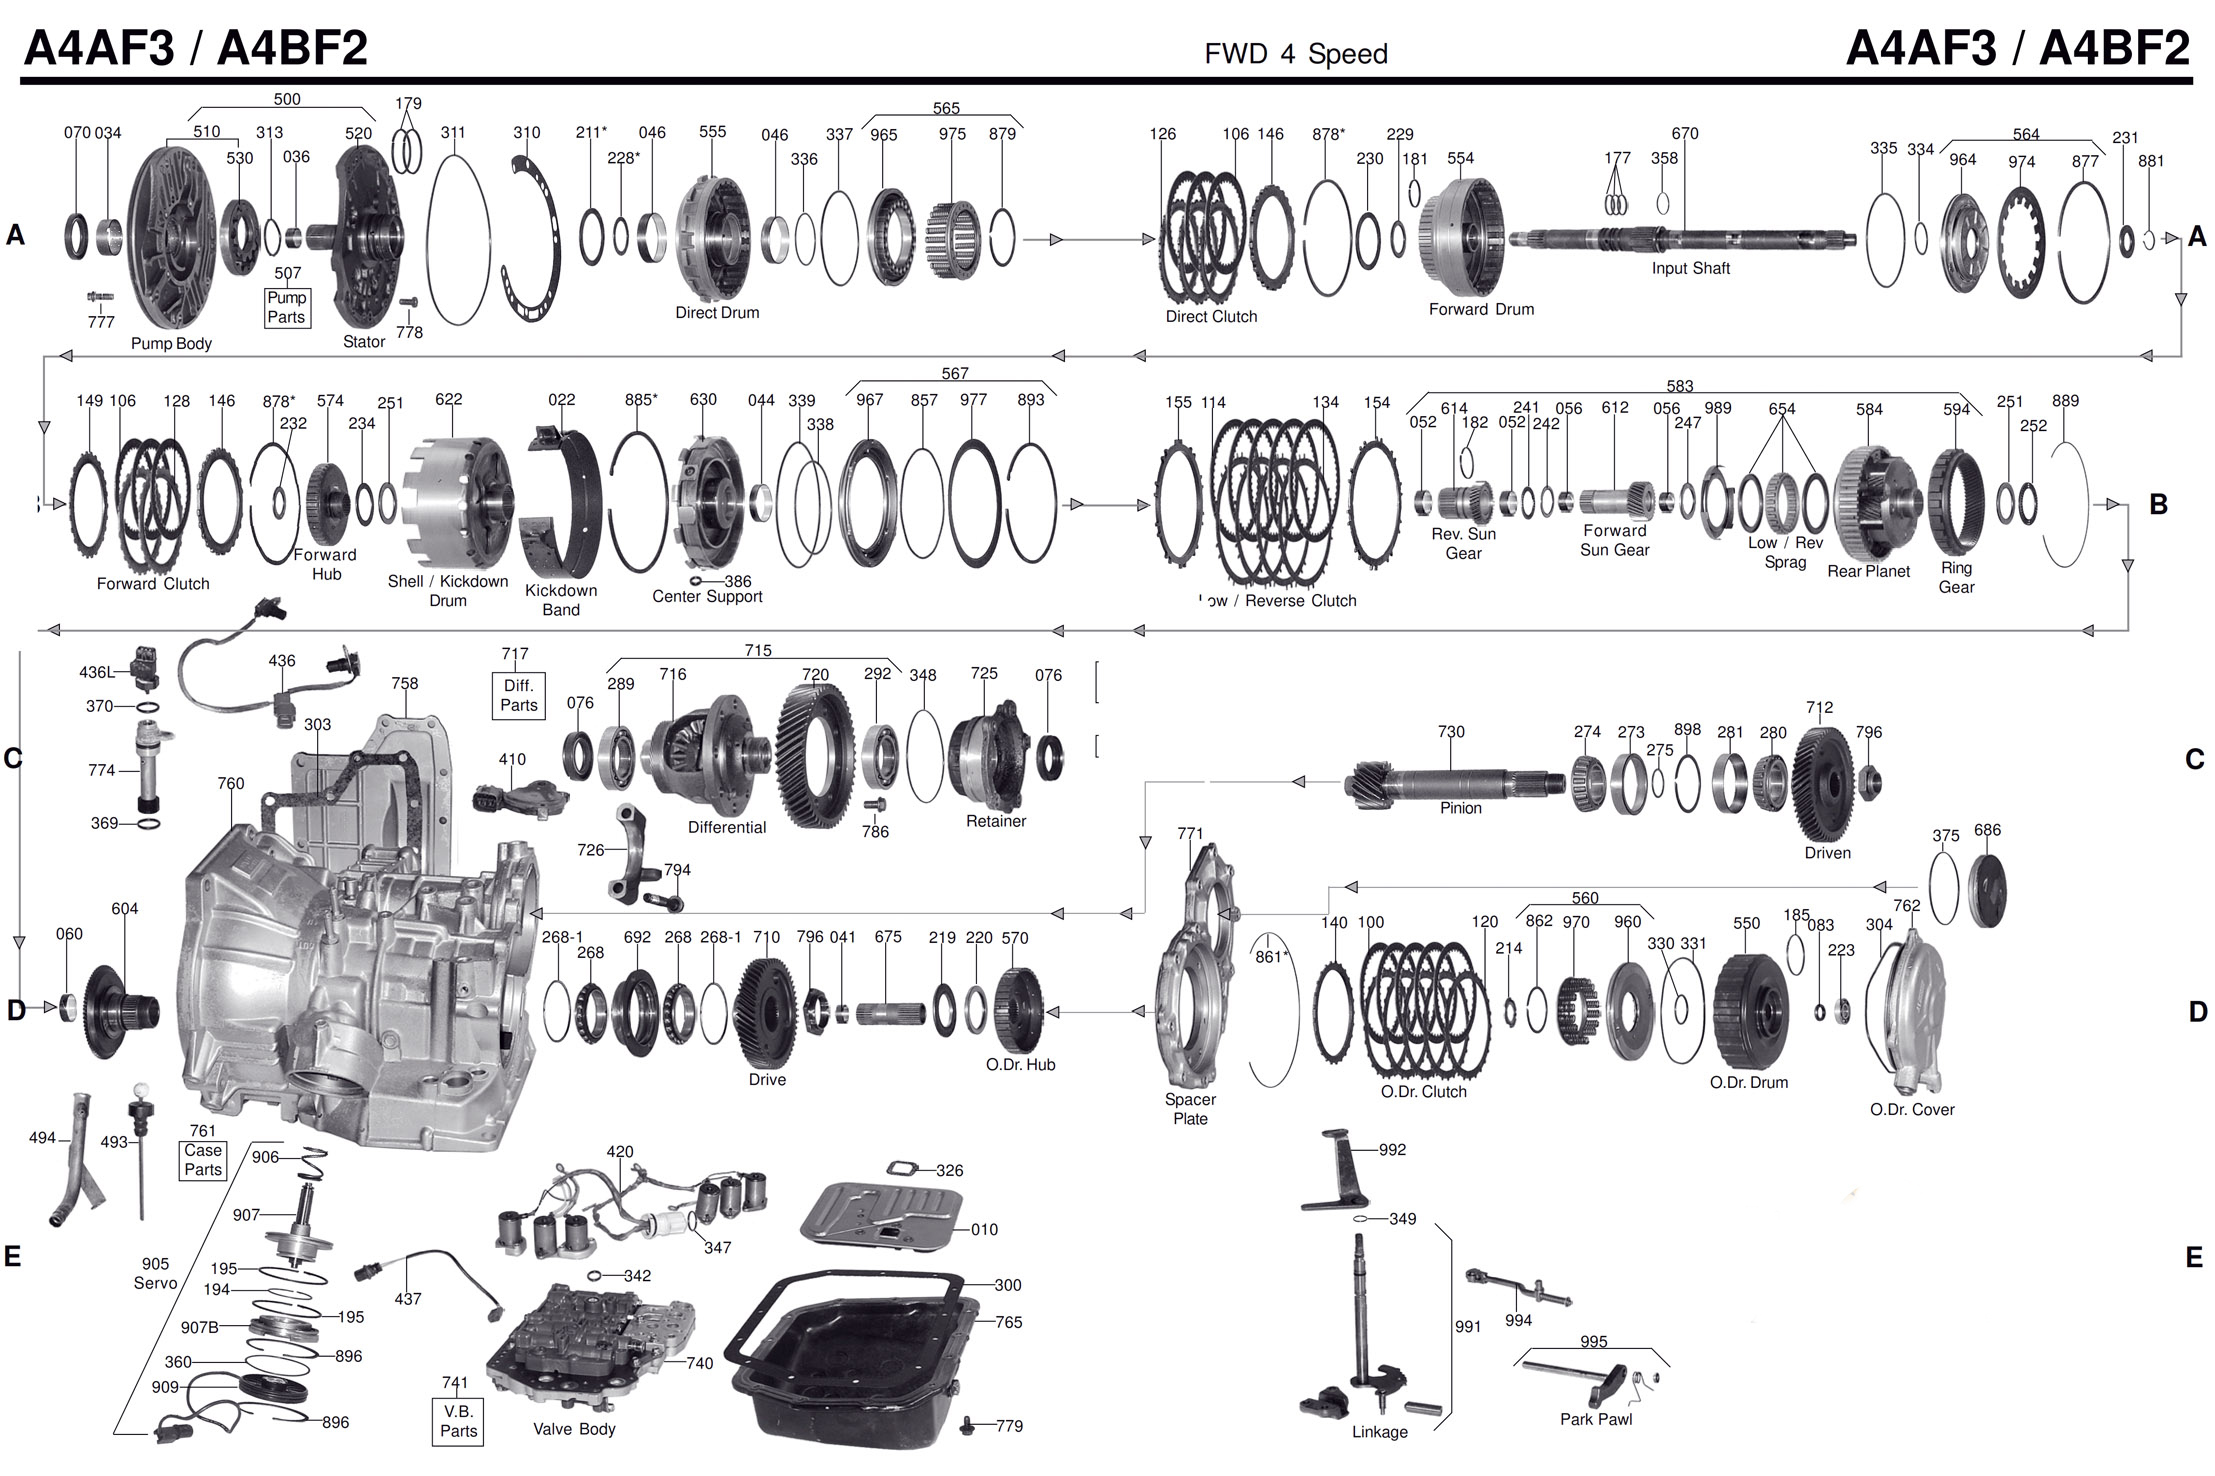 Transmission Repair Manuals A4af3 A4bf3